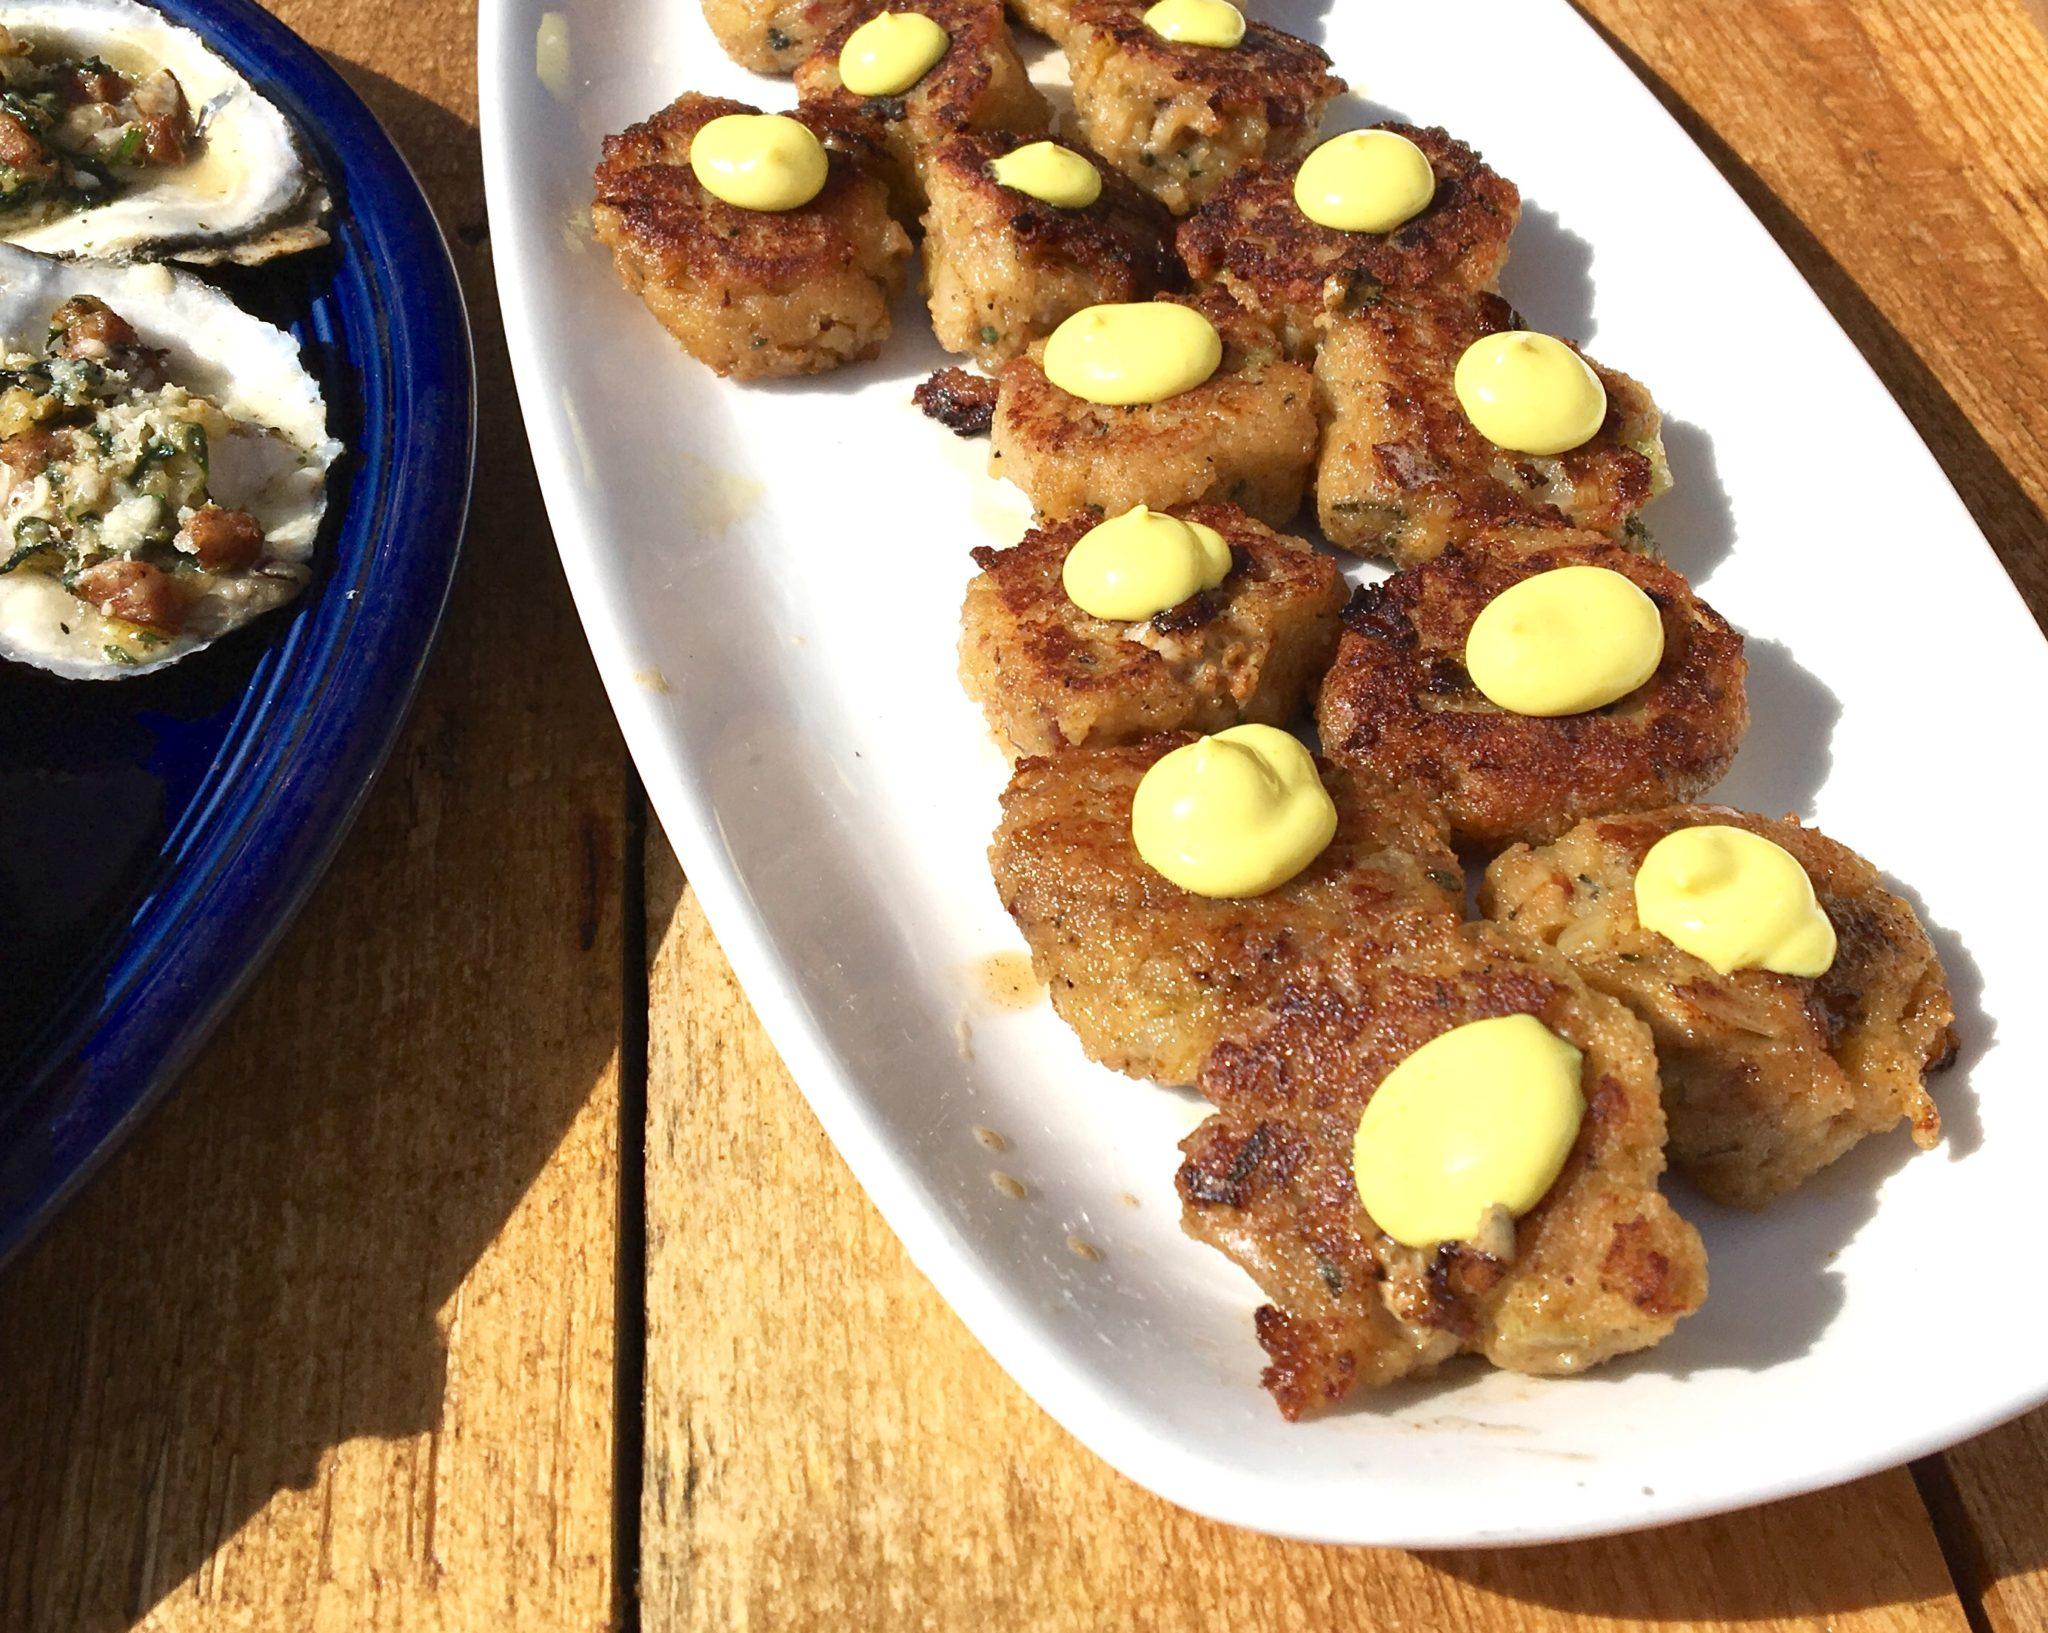 Oyster Cakes with Lemon Turmeric Aioli recipe.